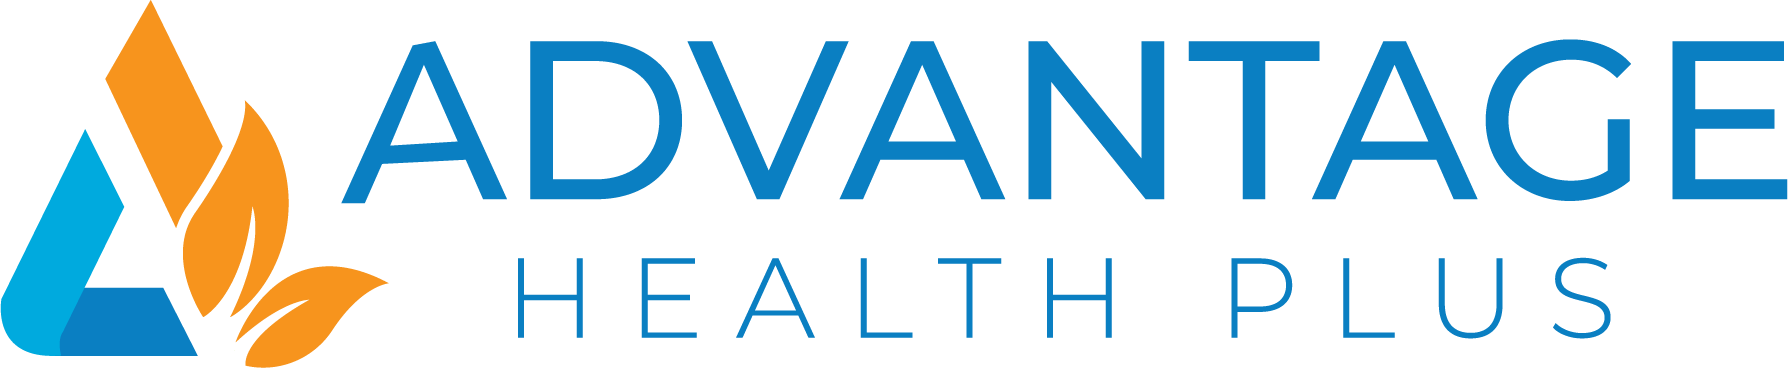 Advantage Health Plus